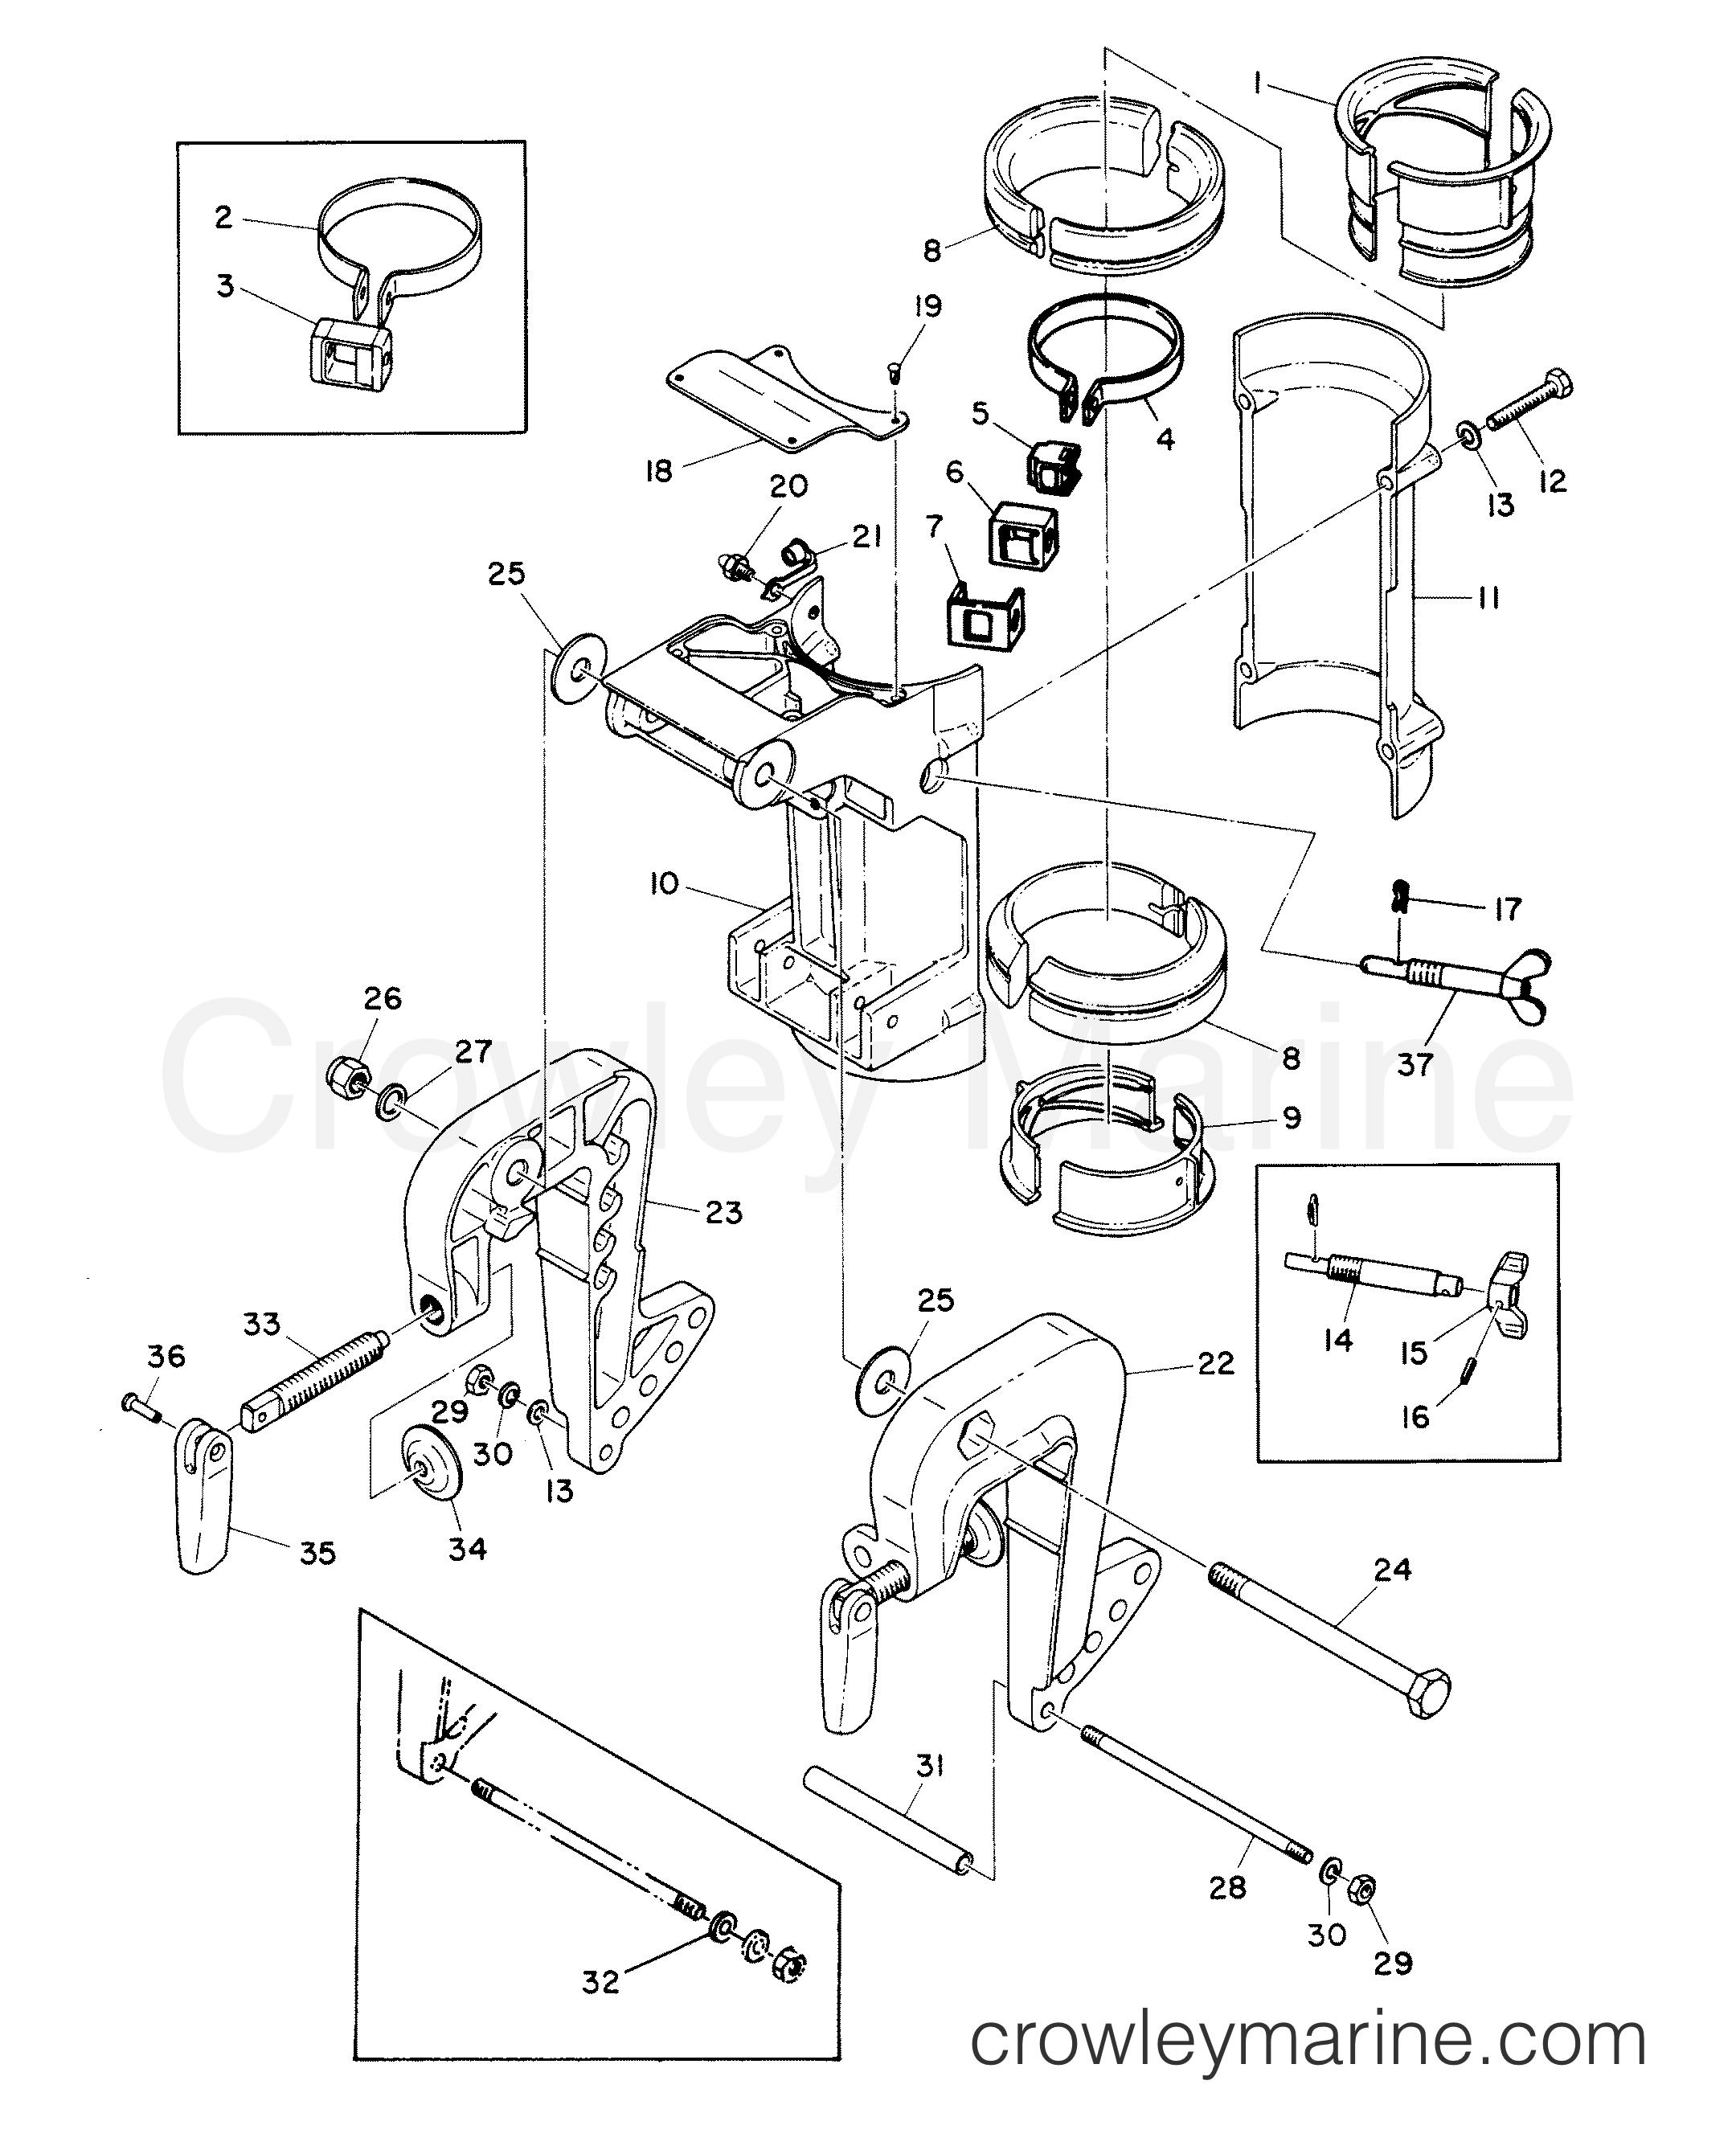 clamp and swivel bracket